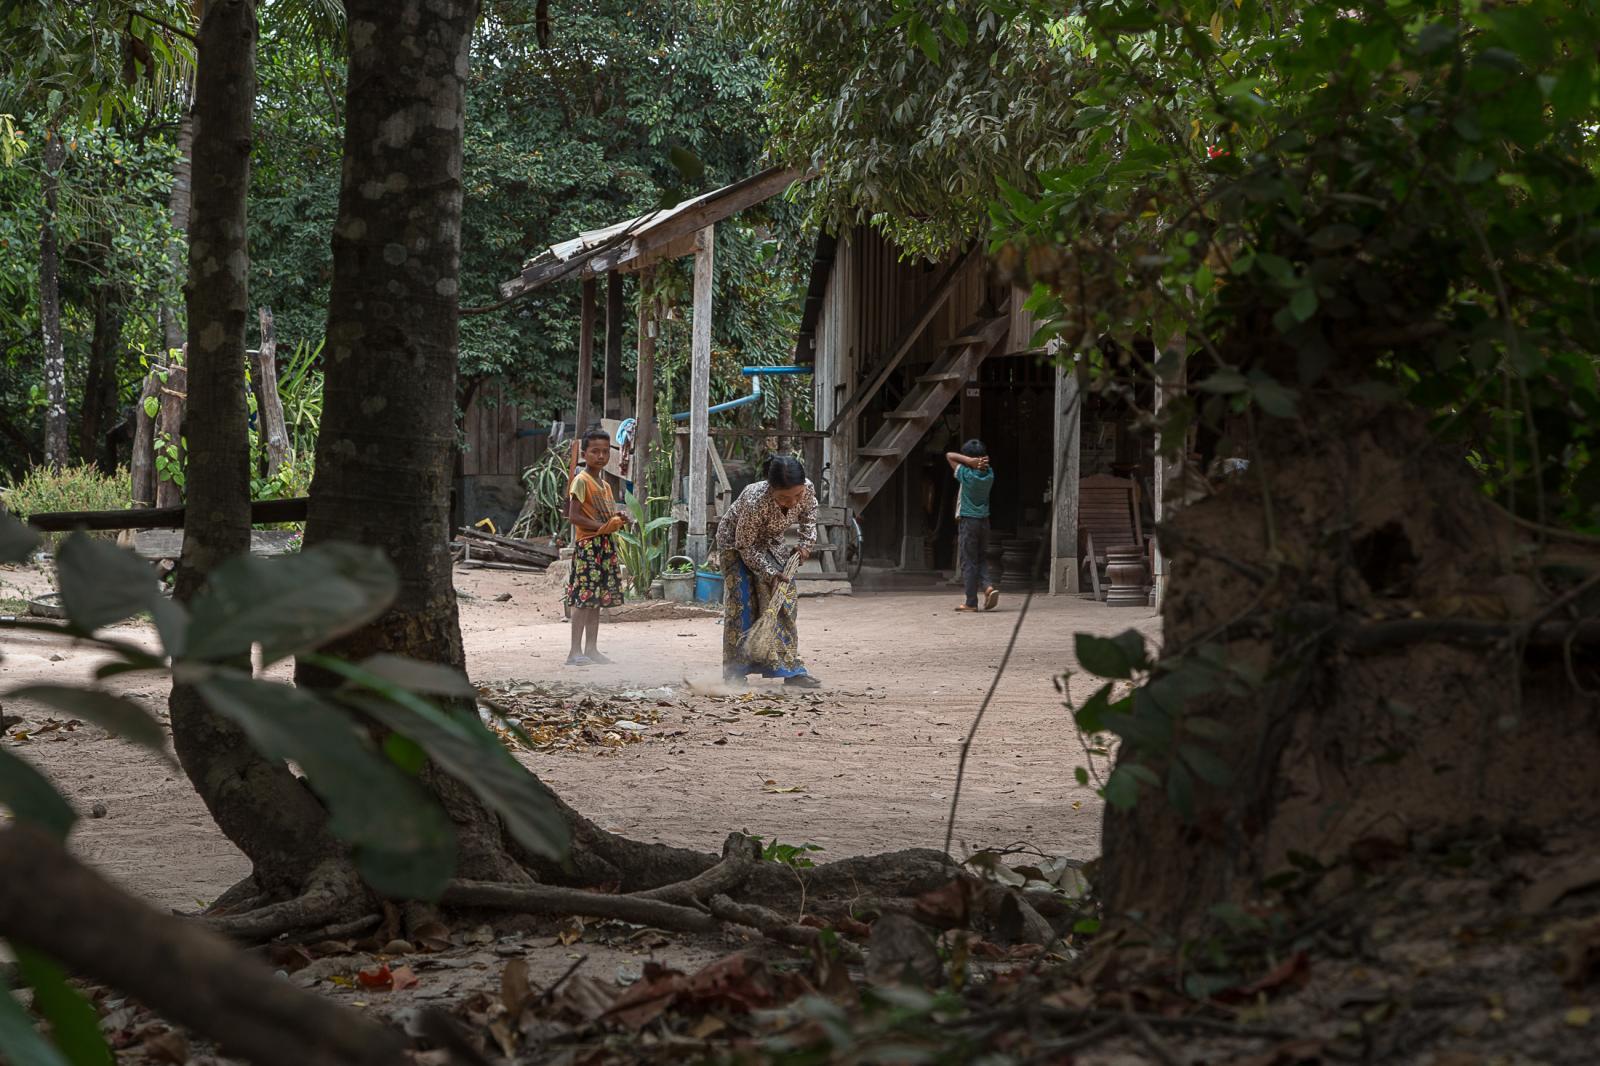 Photography image - Loading 002_Im_Chaem-Cambodia_Omar_Havana.jpg